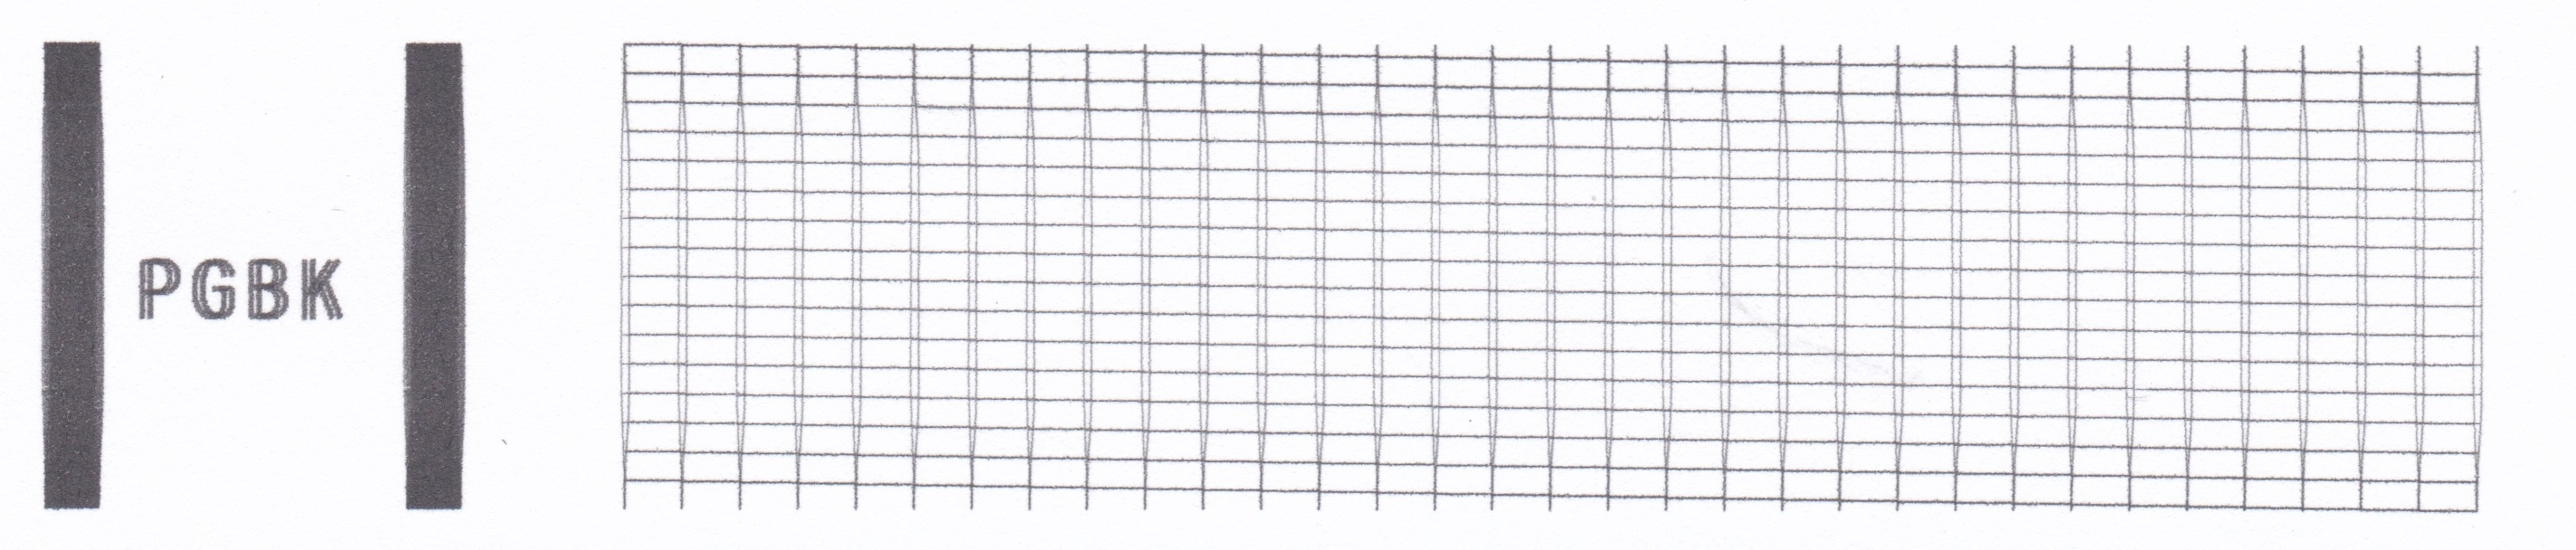 2021-0816_PGBK alignment pattern.jpg